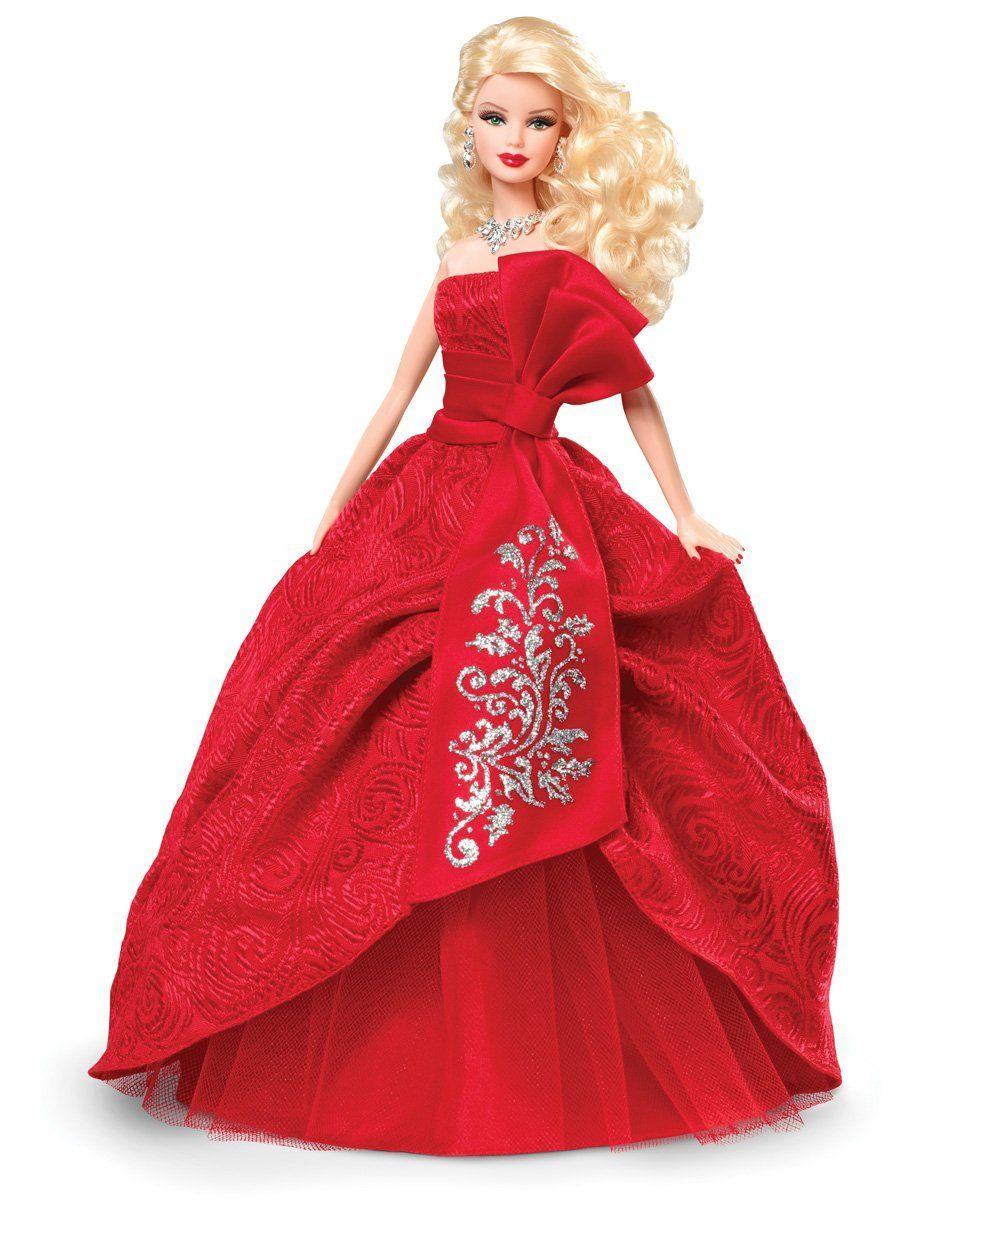 Barbie Joyeux Noel Amazon.com: Barbie Collector 2012 Holiday Doll: Toys & Games